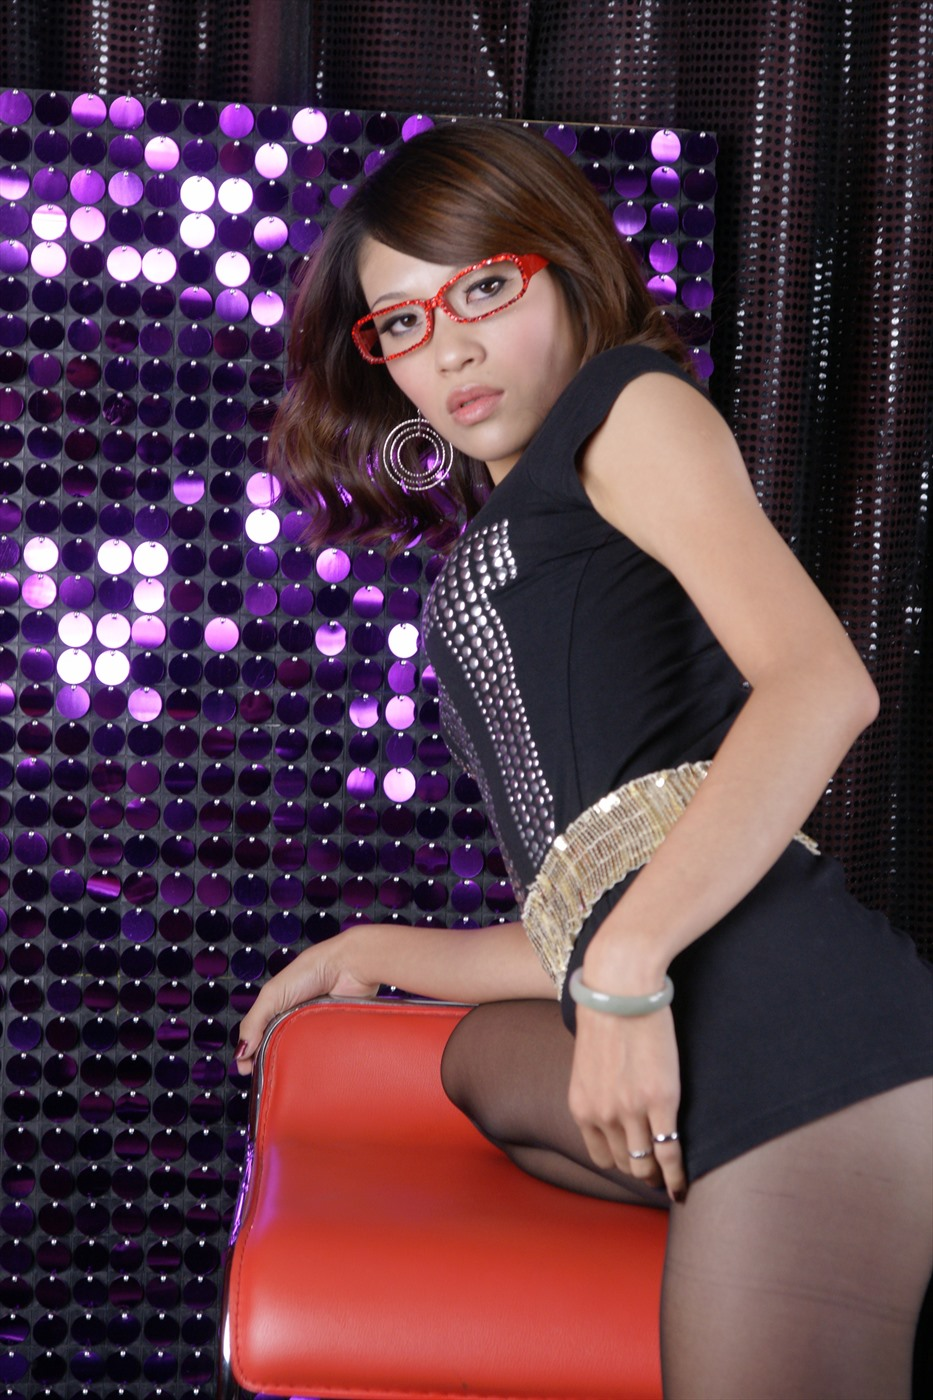 IMG 0001 - 82 Taiwan Model Jieli Juicy Pussy